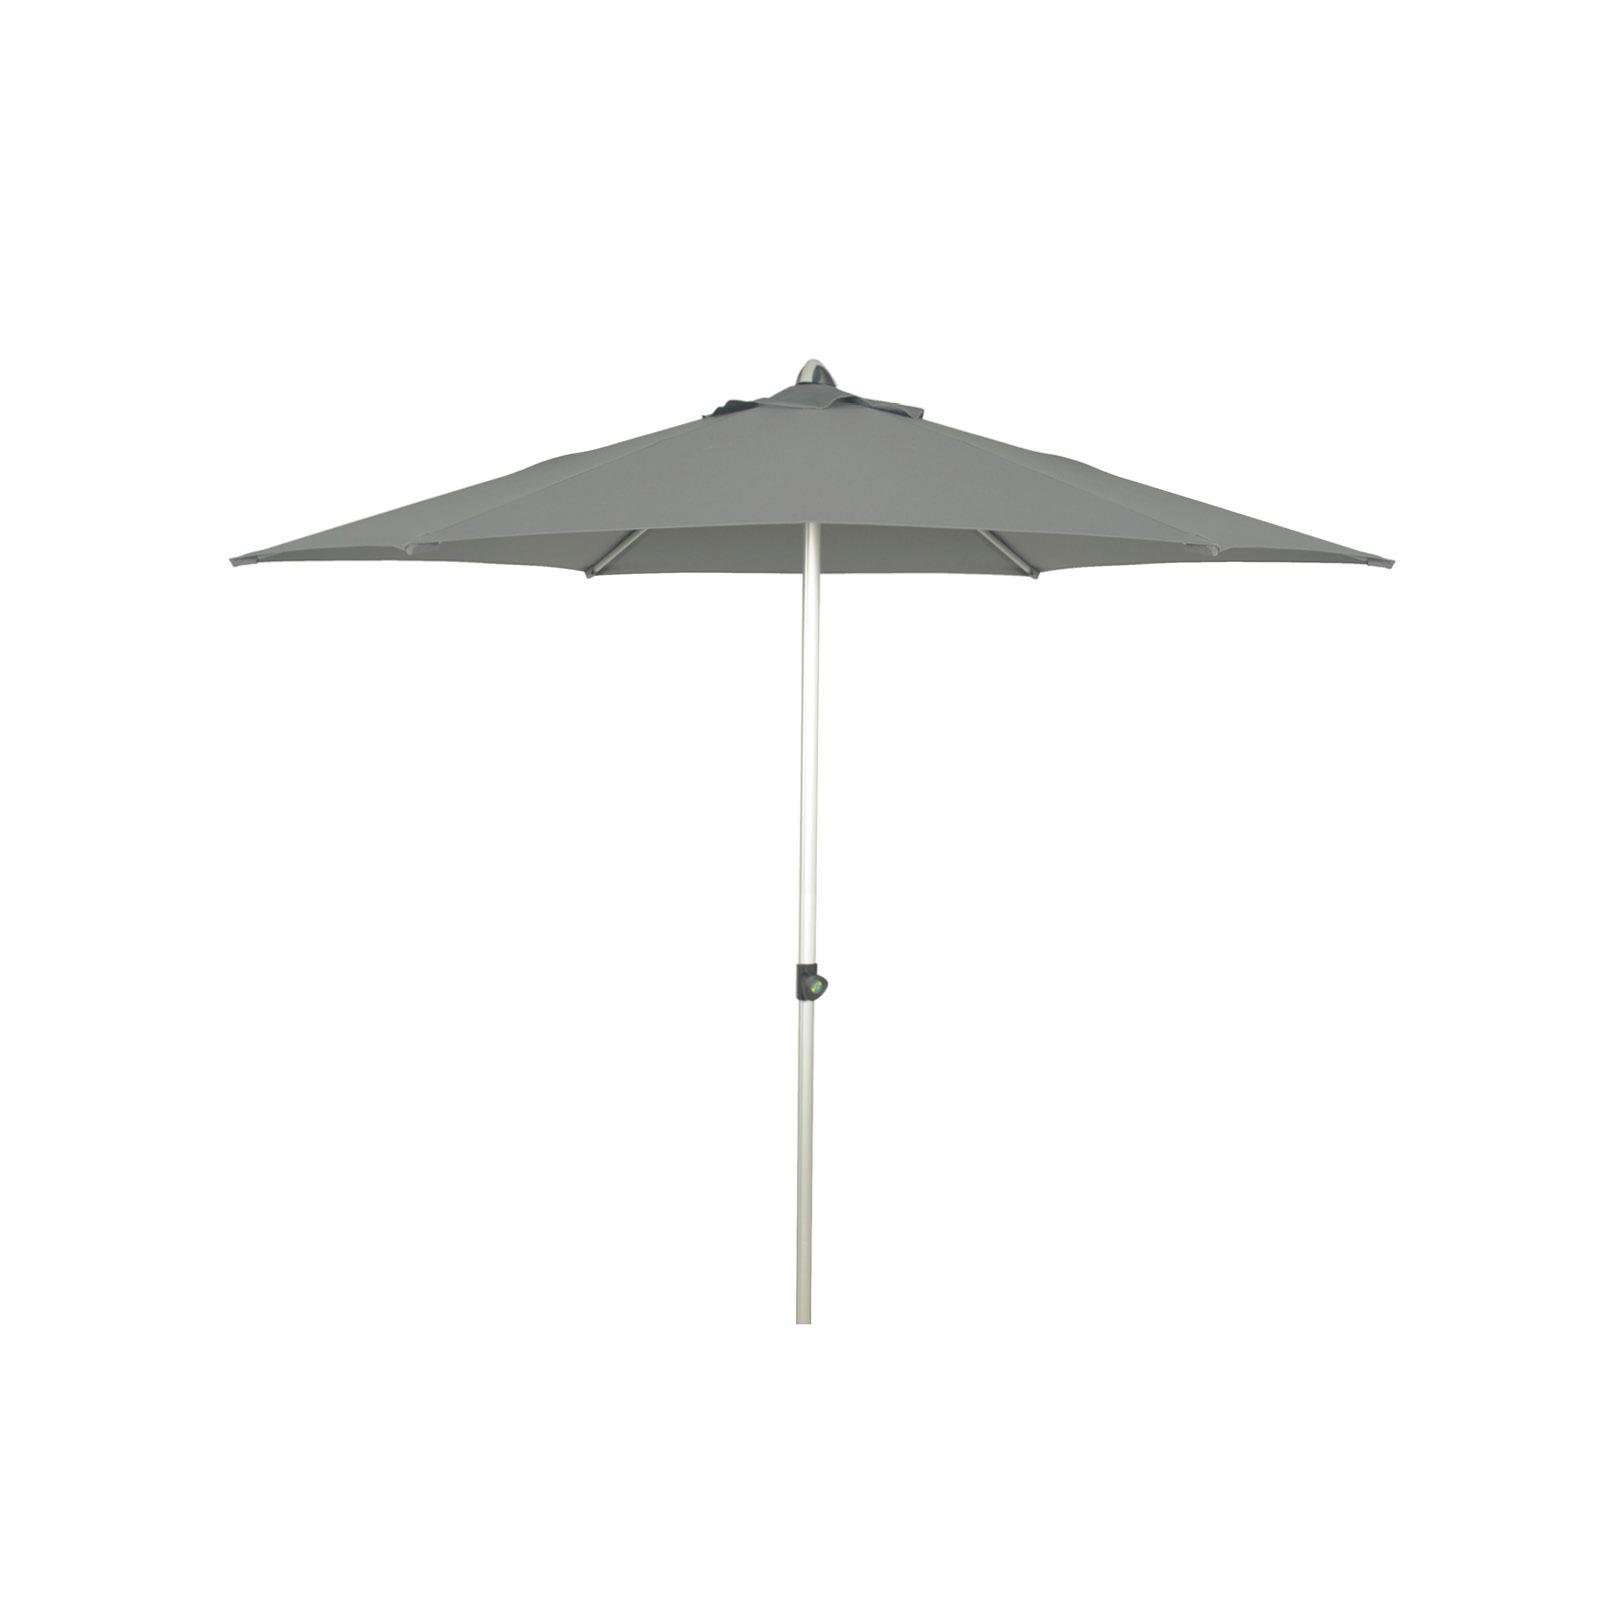 Coolaroo 2.7m Charcoal Chelsea Round Market Umbrella